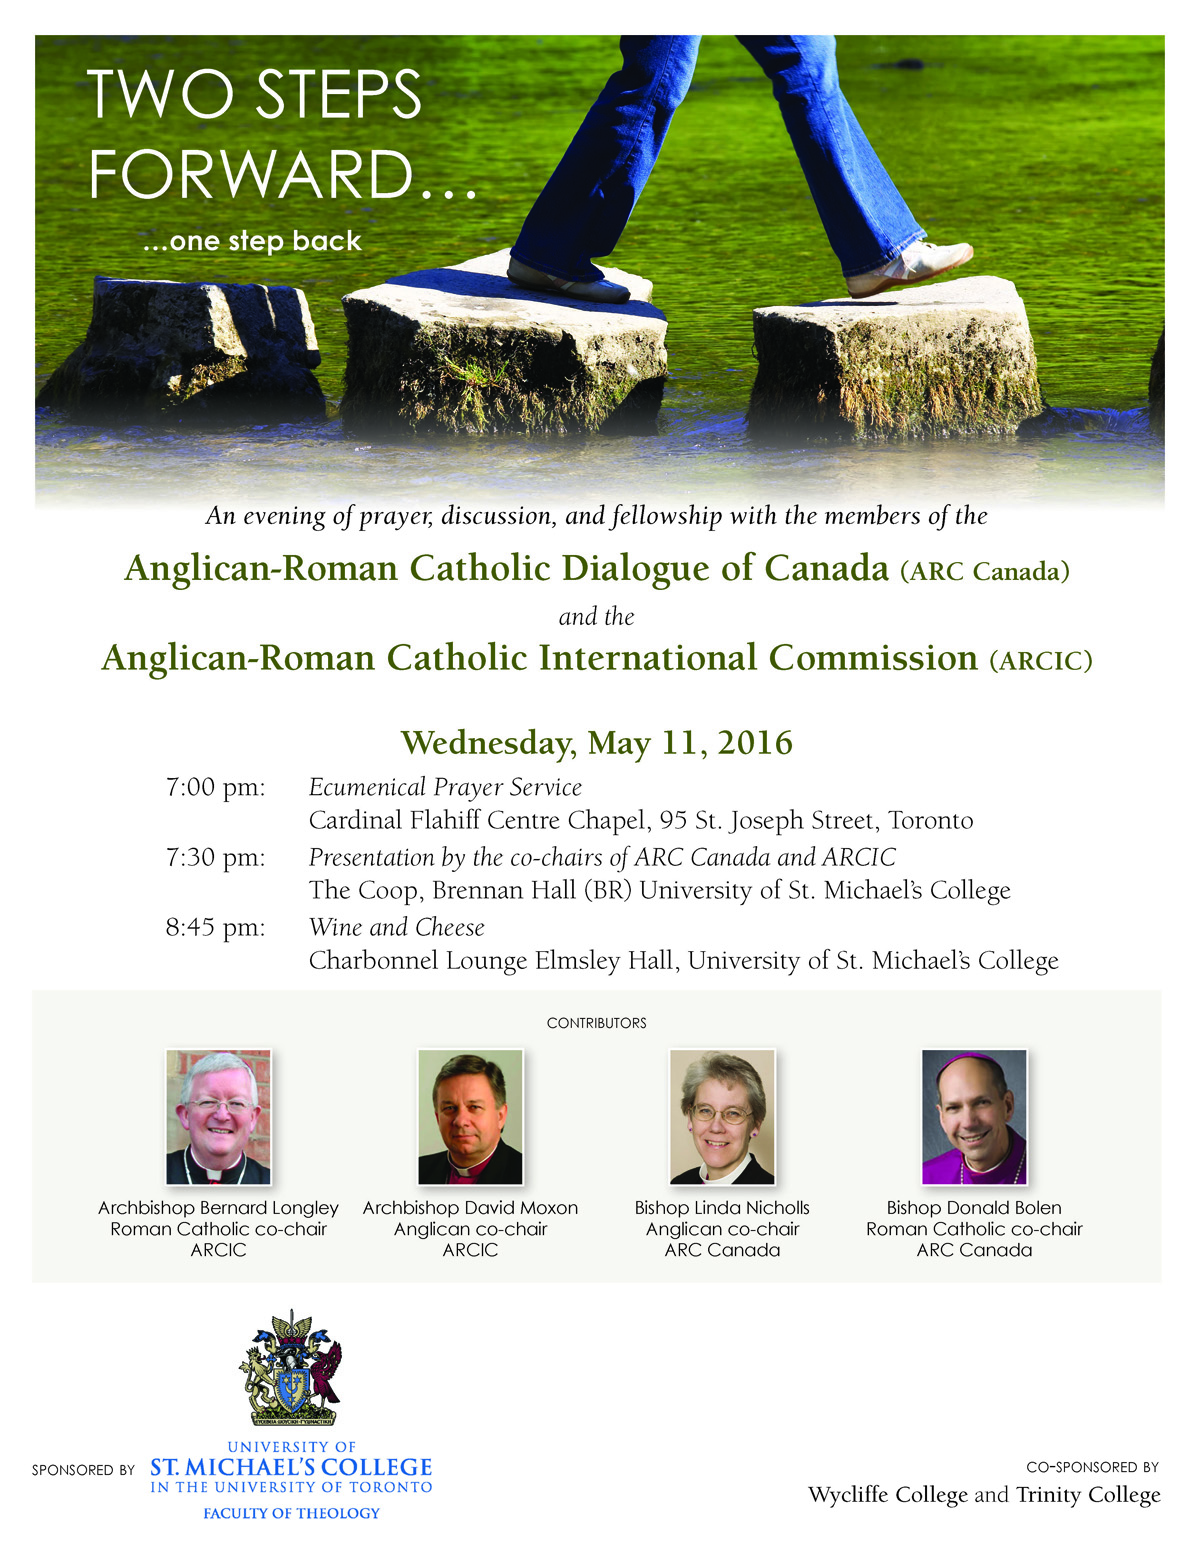 Anglican-Roman Catholic Dialogue Event May 11, 2016